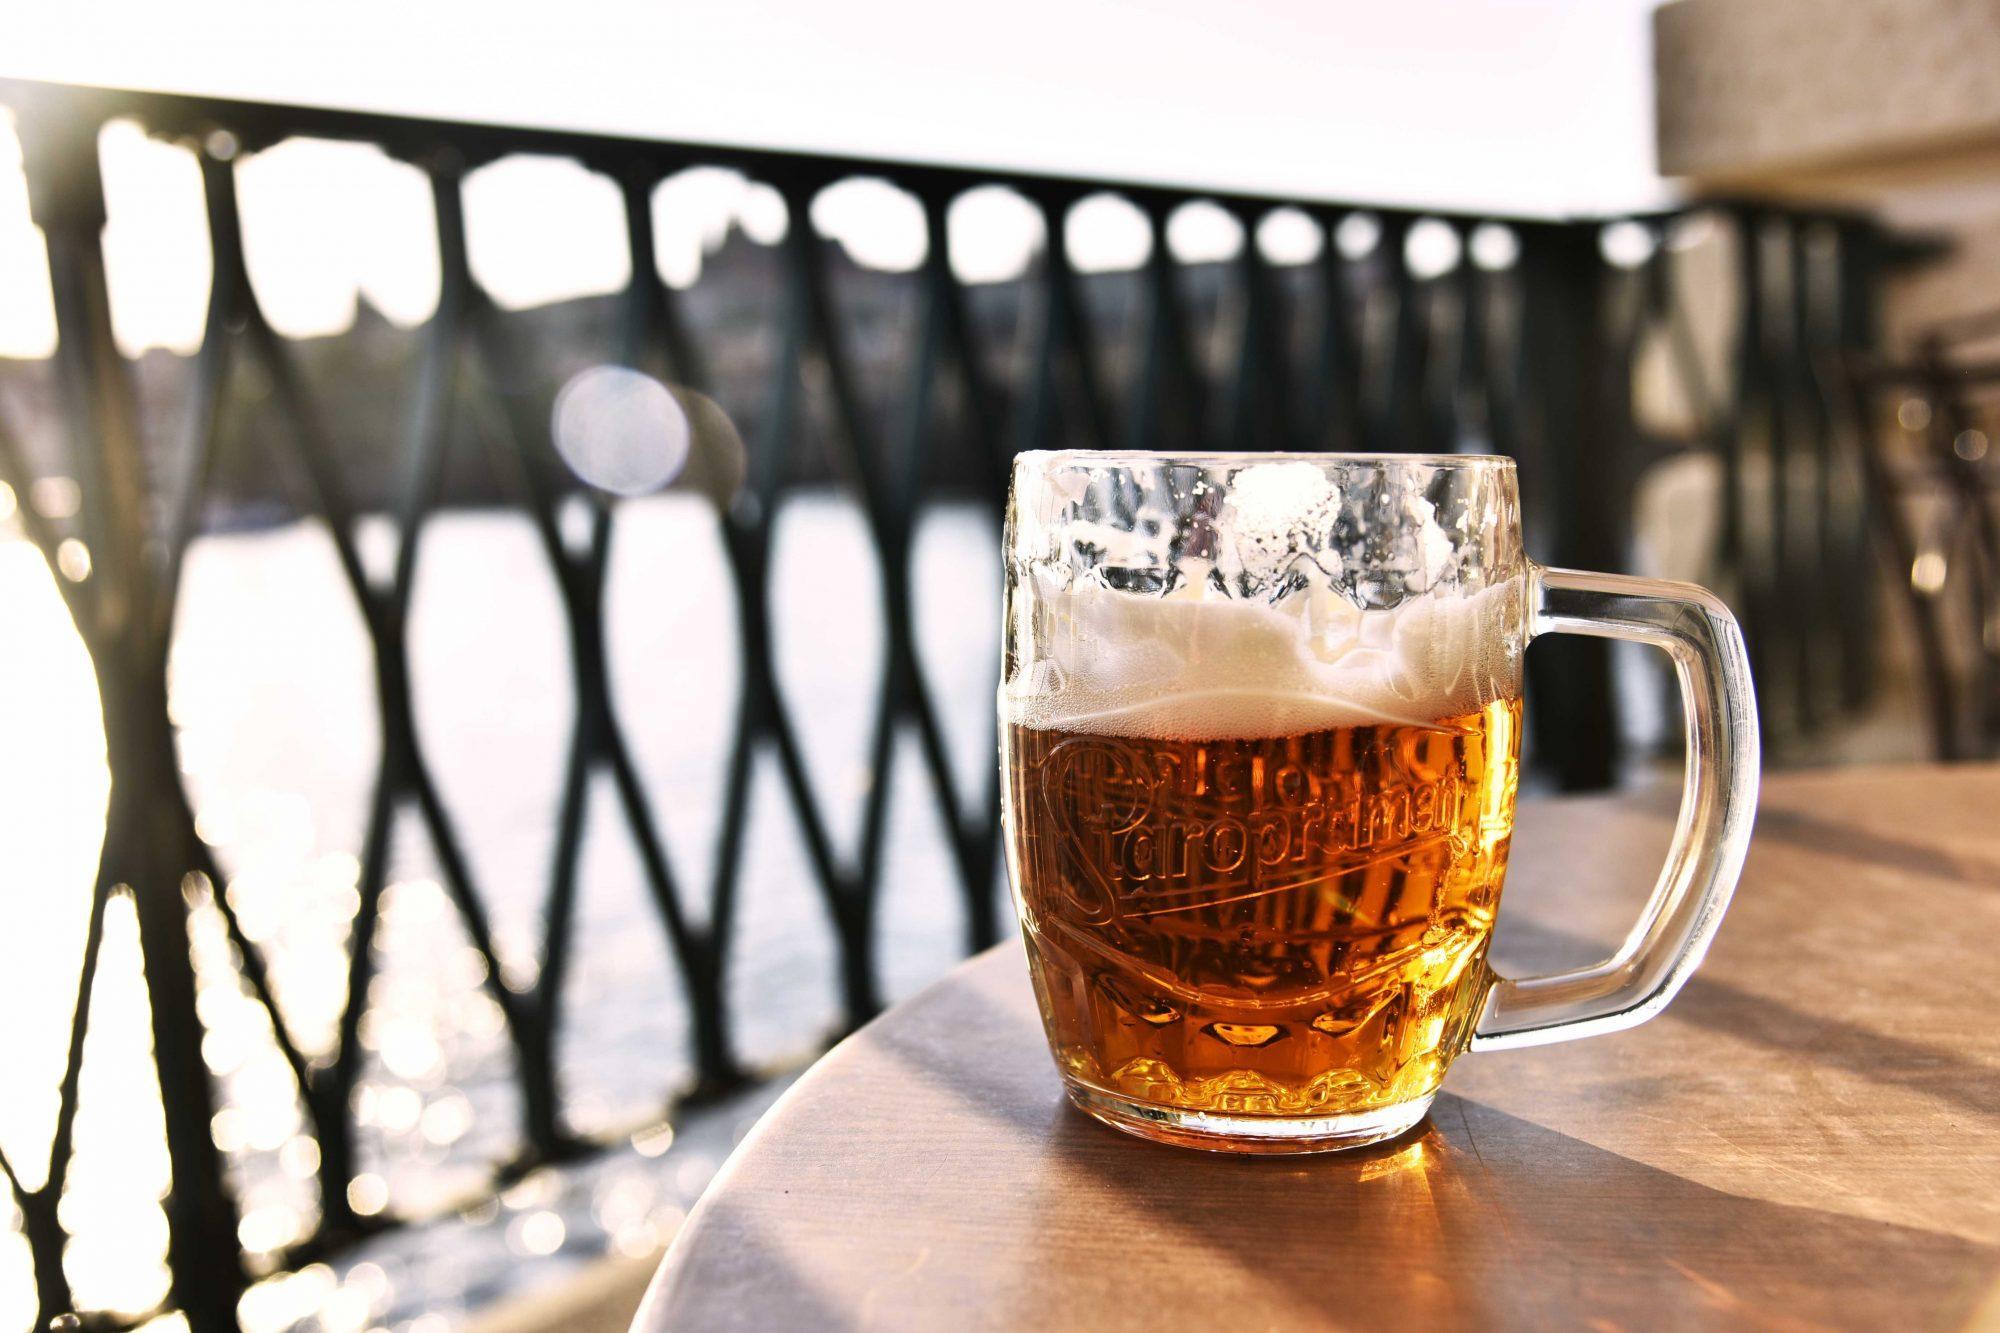 sör, nyár, korsó